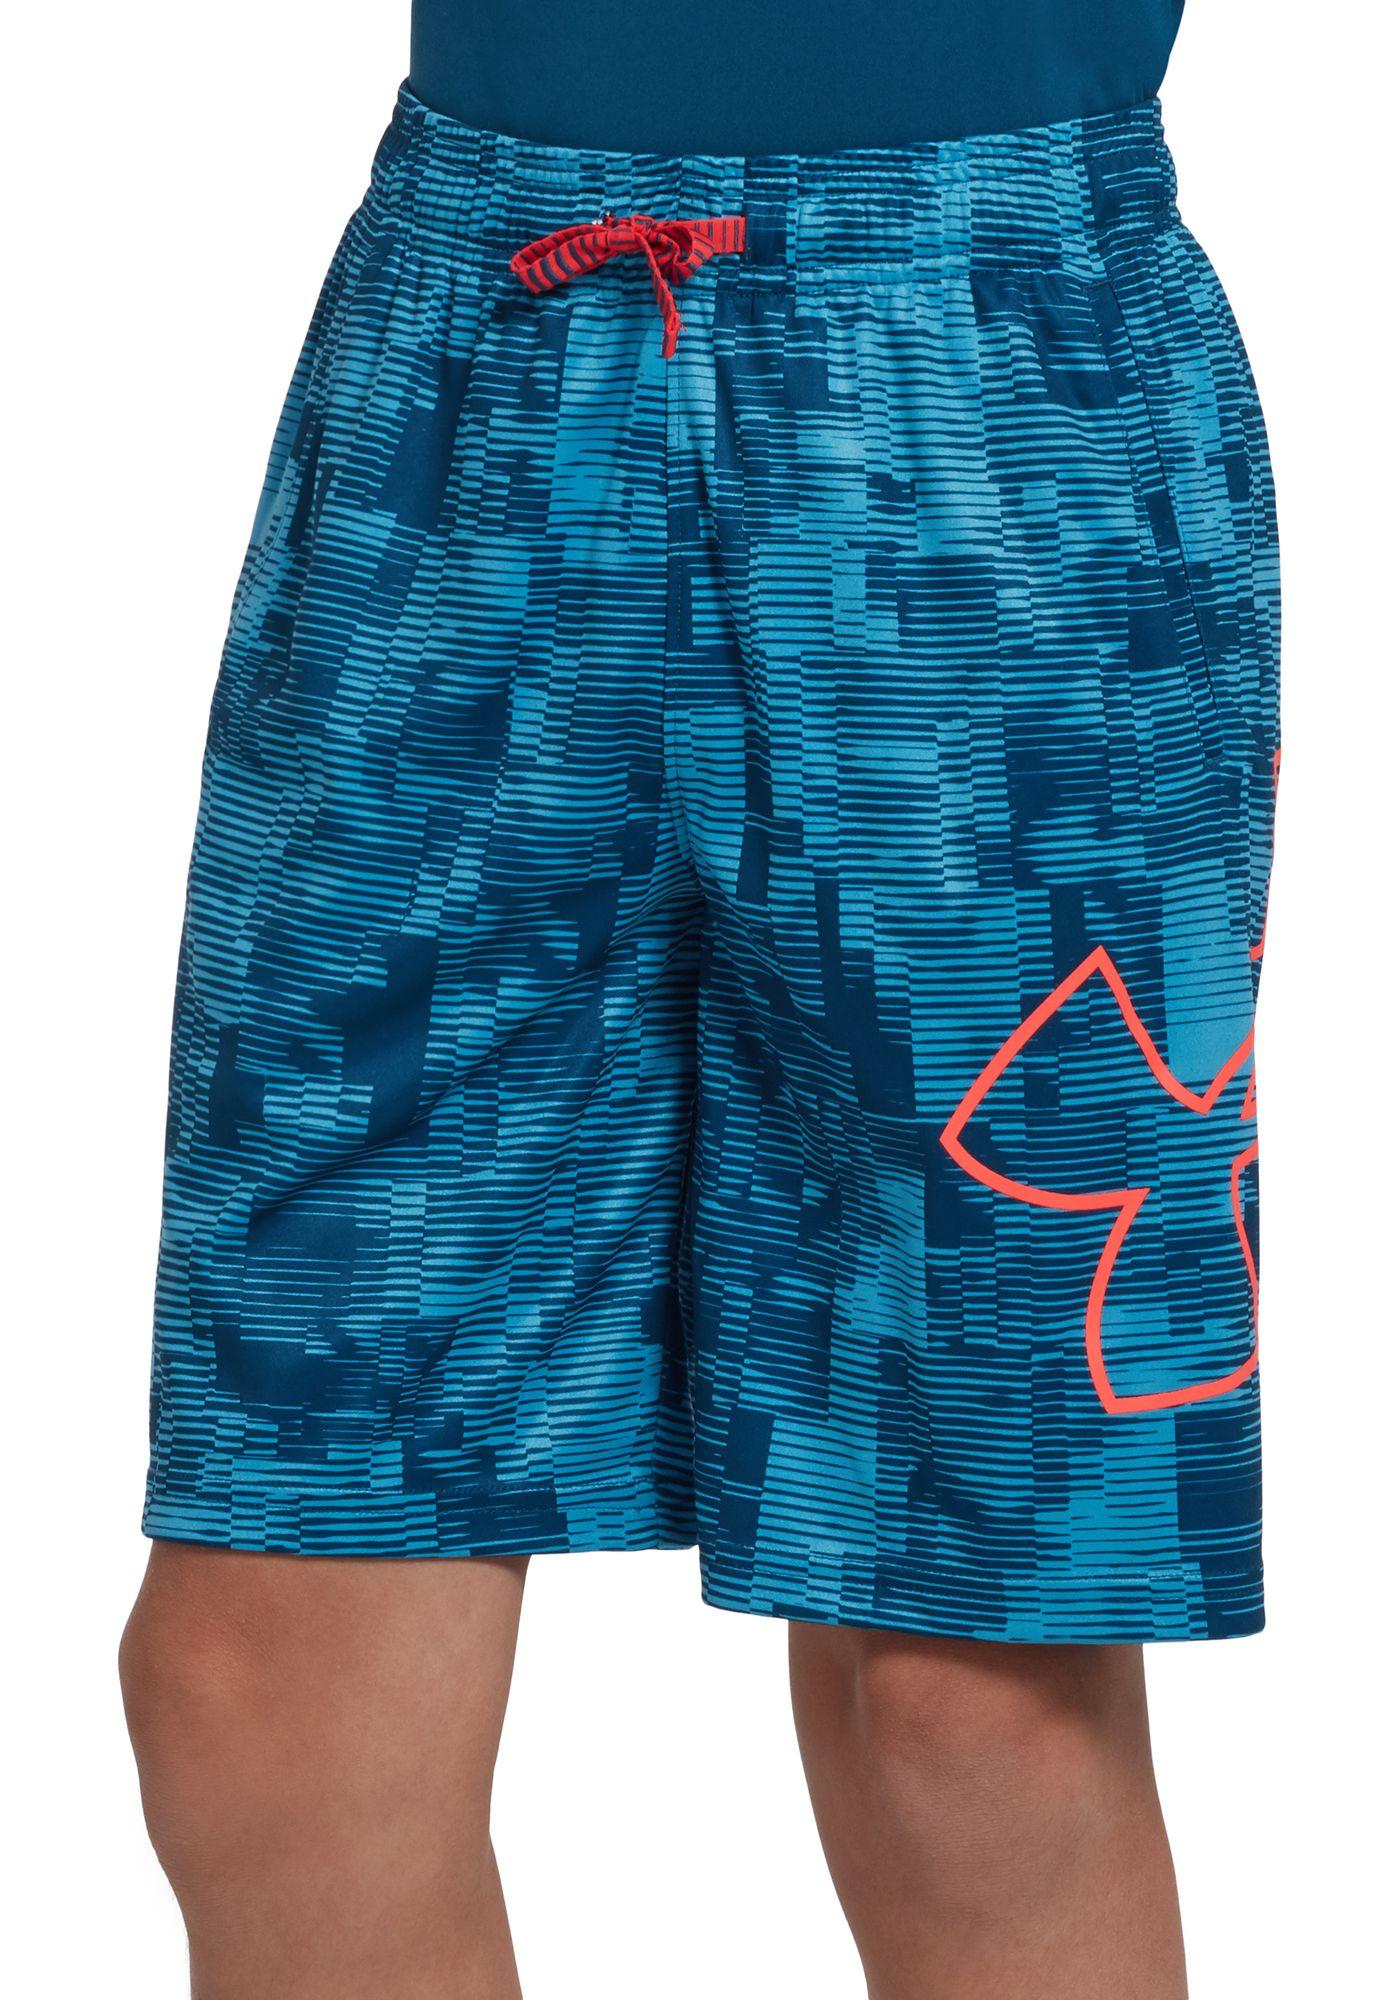 Under Armour Boys' Renegade 2.0 Jacquard Shorts